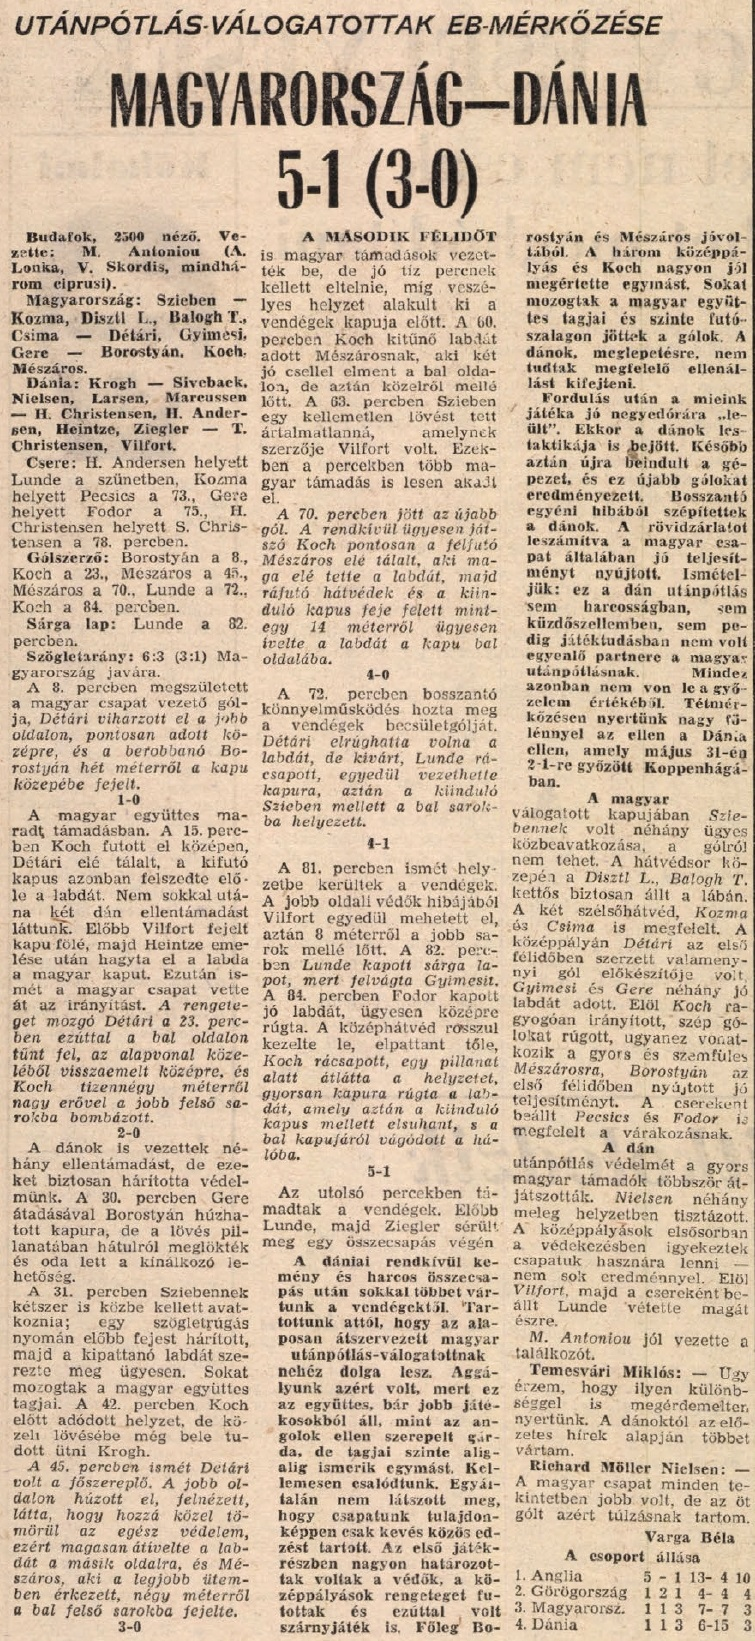 idokapszula_nb_i_1983_84_magyarorszag_dania_eb-selejtezo_utanpotlas.jpg